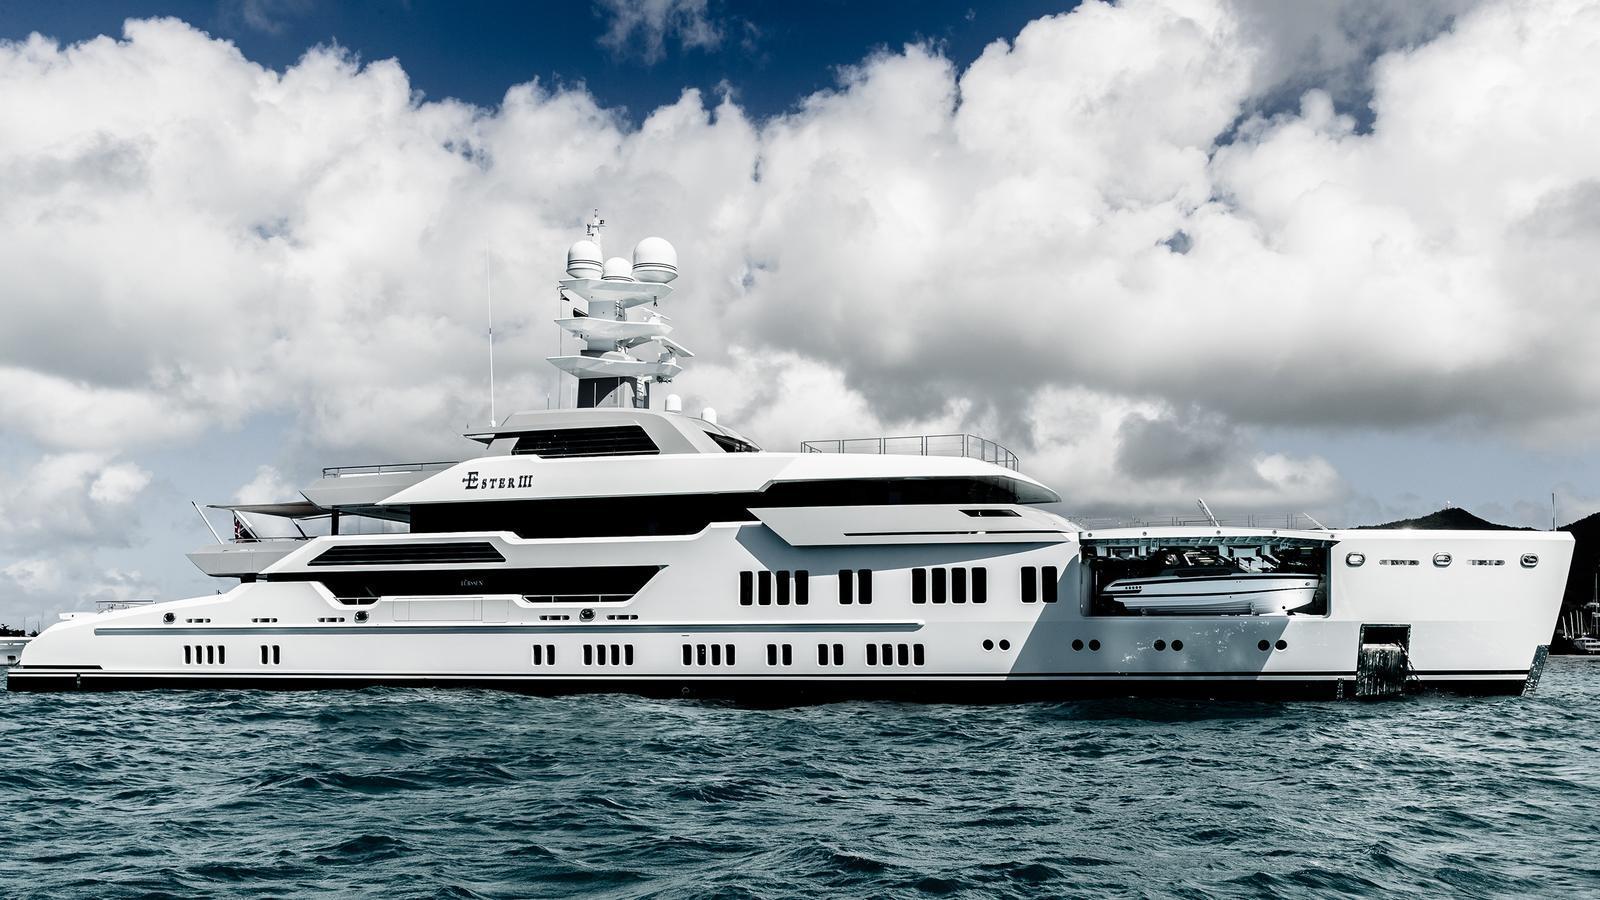 iroquois ester iii motor yacht lurssen 2014 66m profile